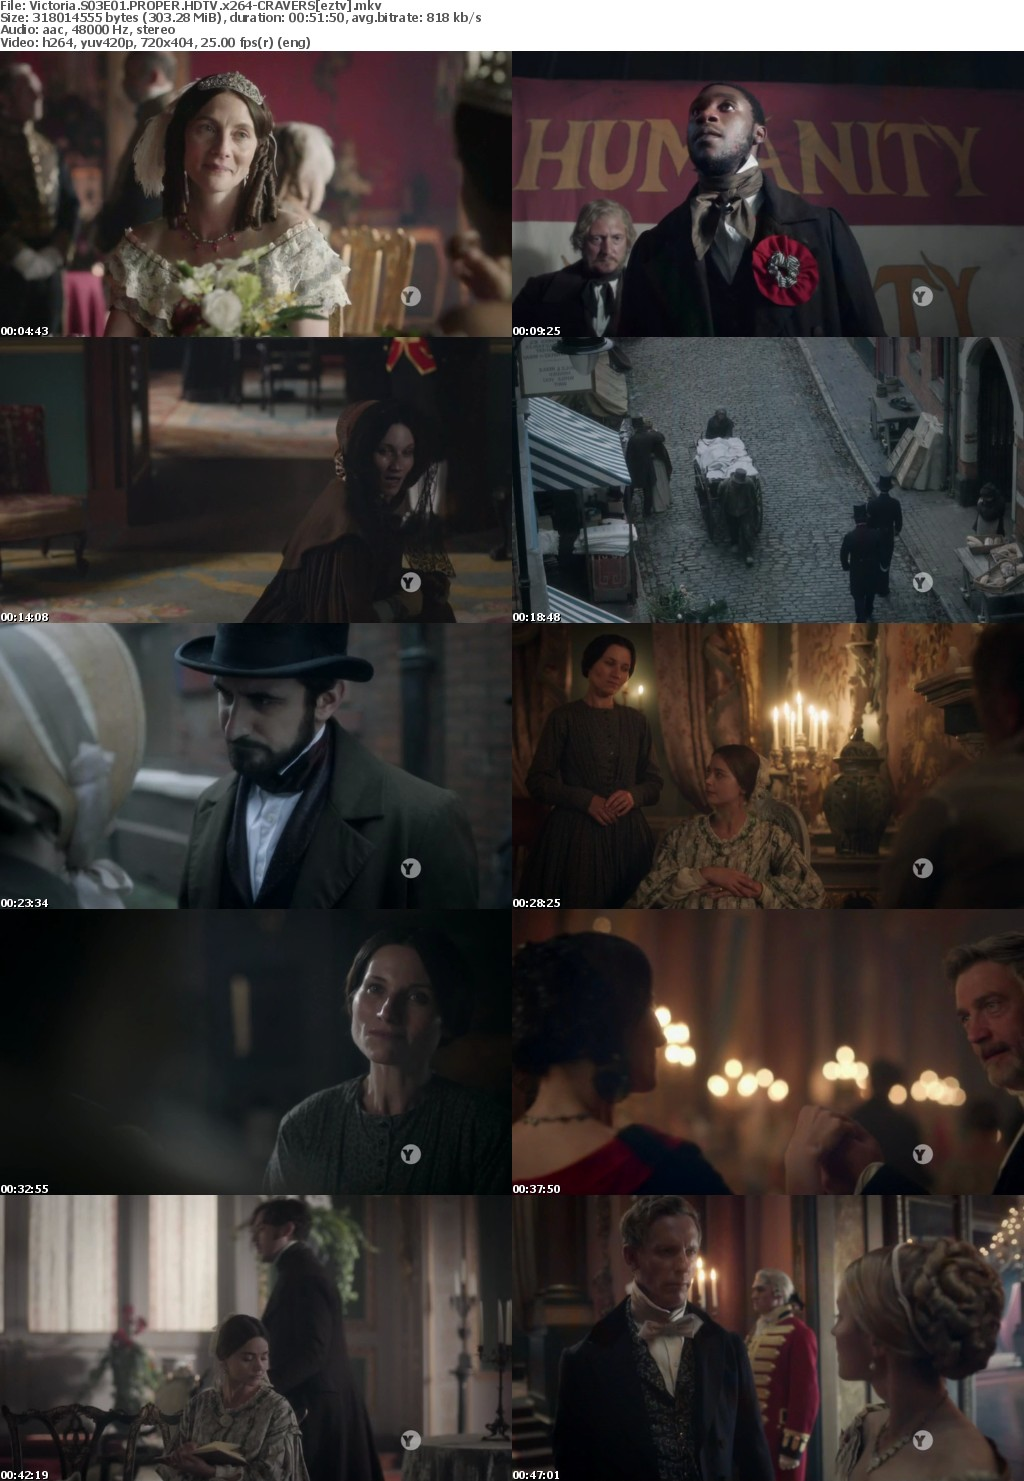 Victoria S03E01 PROPER HDTV x264-CRAVERS